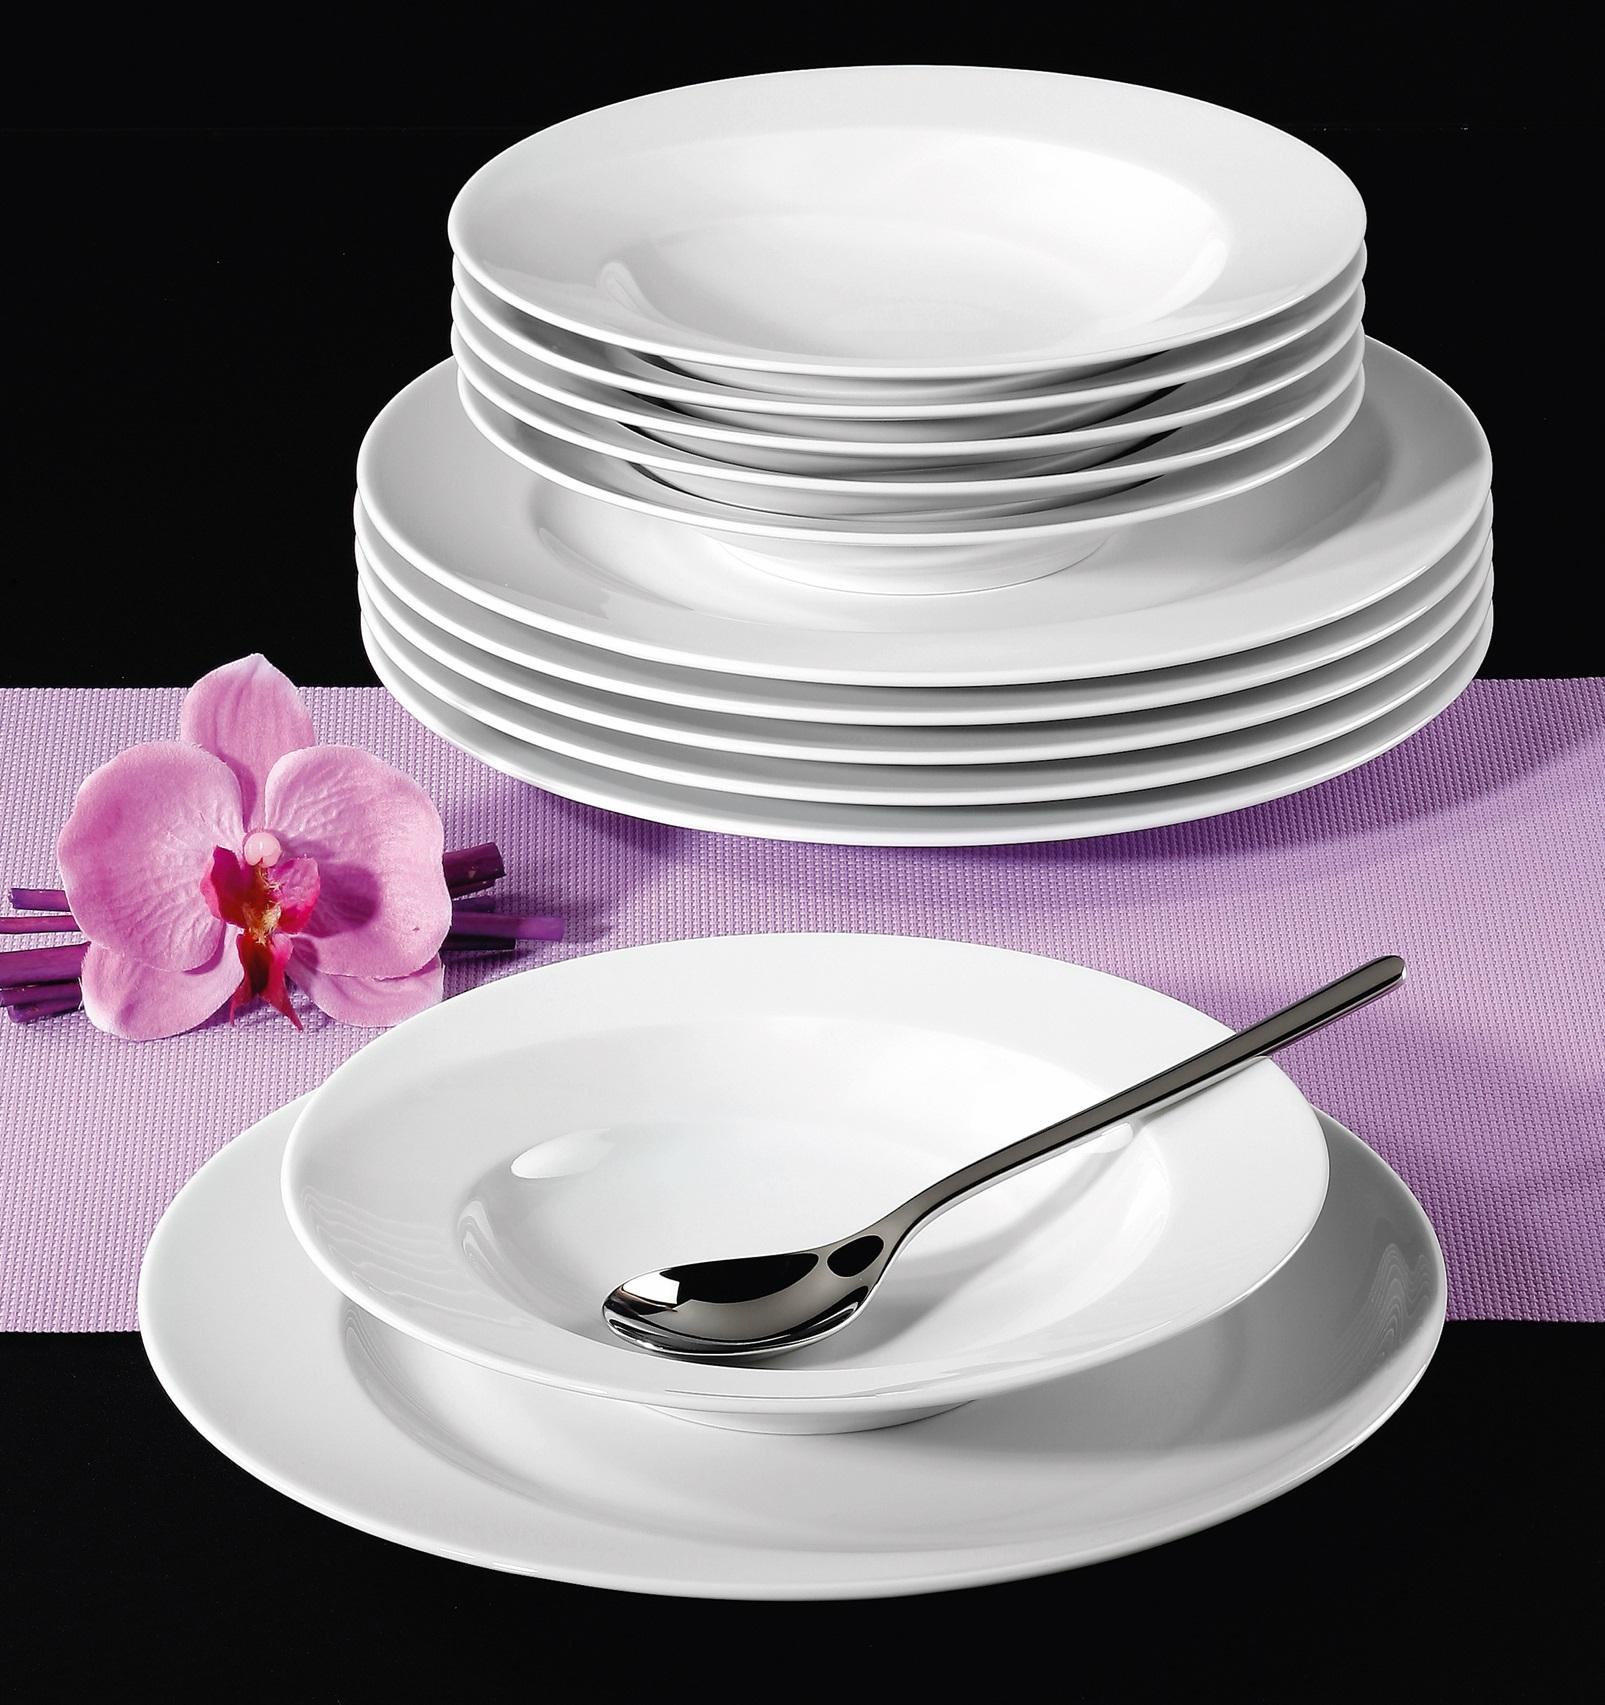 seltmann weiden paso 03 tafelservice 12 teilig f rund ebay. Black Bedroom Furniture Sets. Home Design Ideas